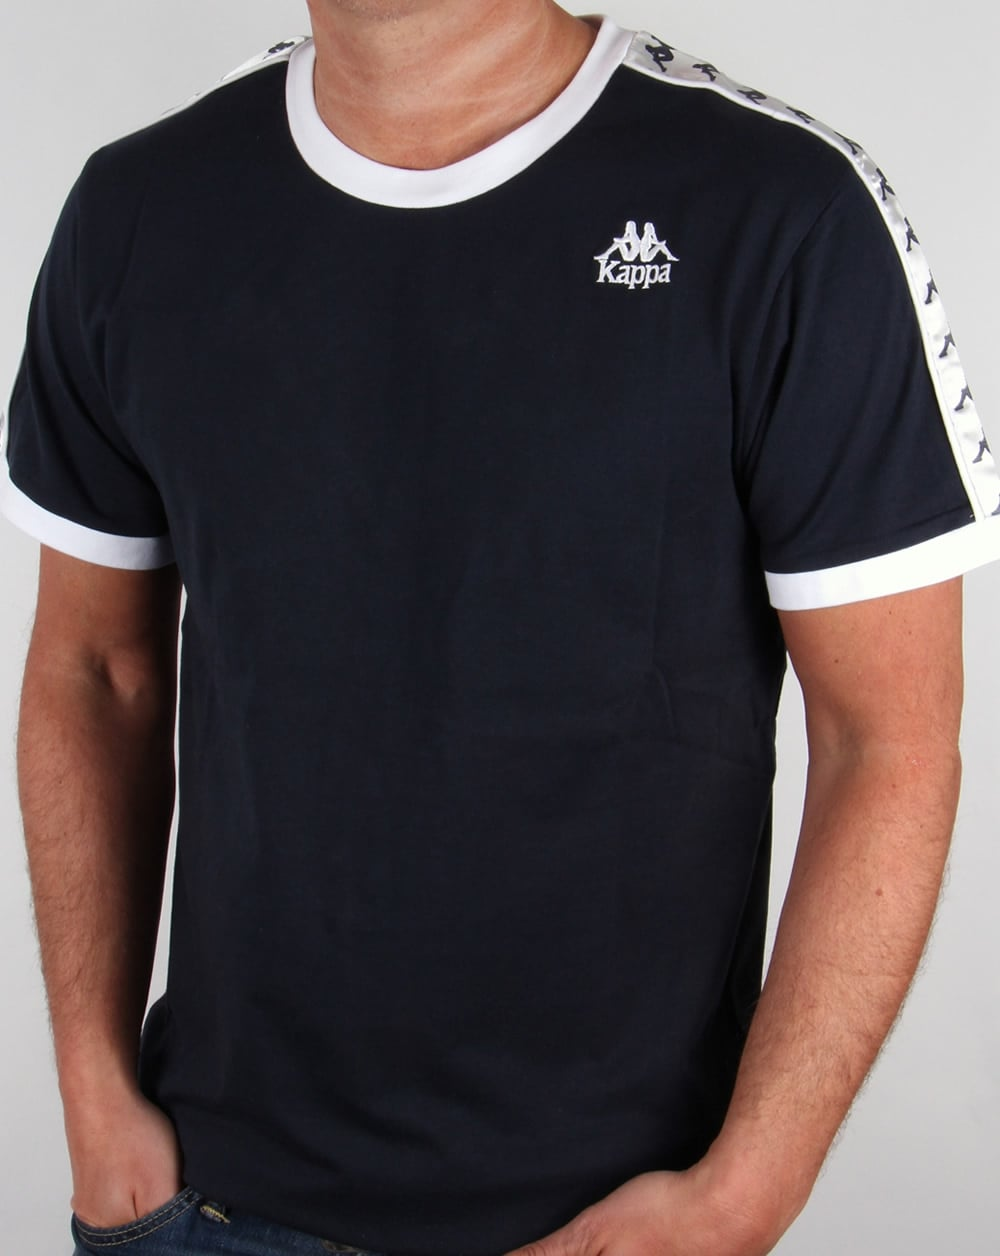 sneakers for cheap 1e1d7 104e5 Robe Di Kappa Logo Ringer Taping T-shirt Navy